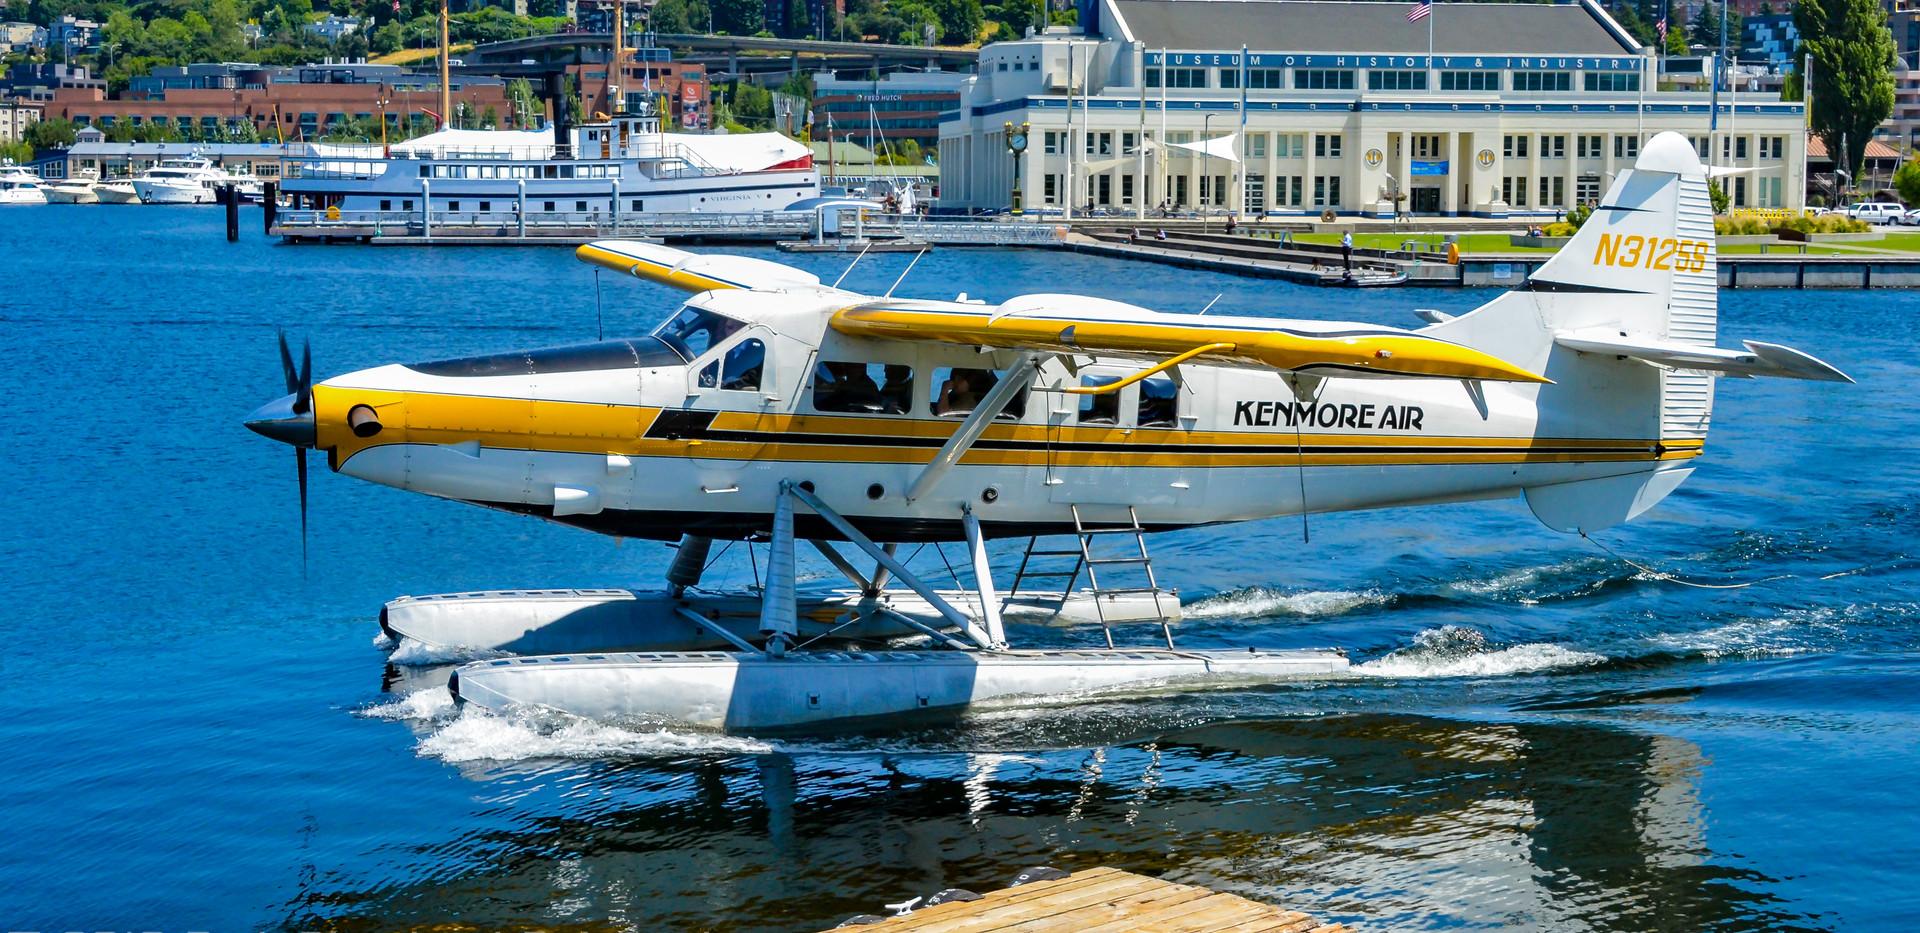 Kenmore Air Turbine Otter